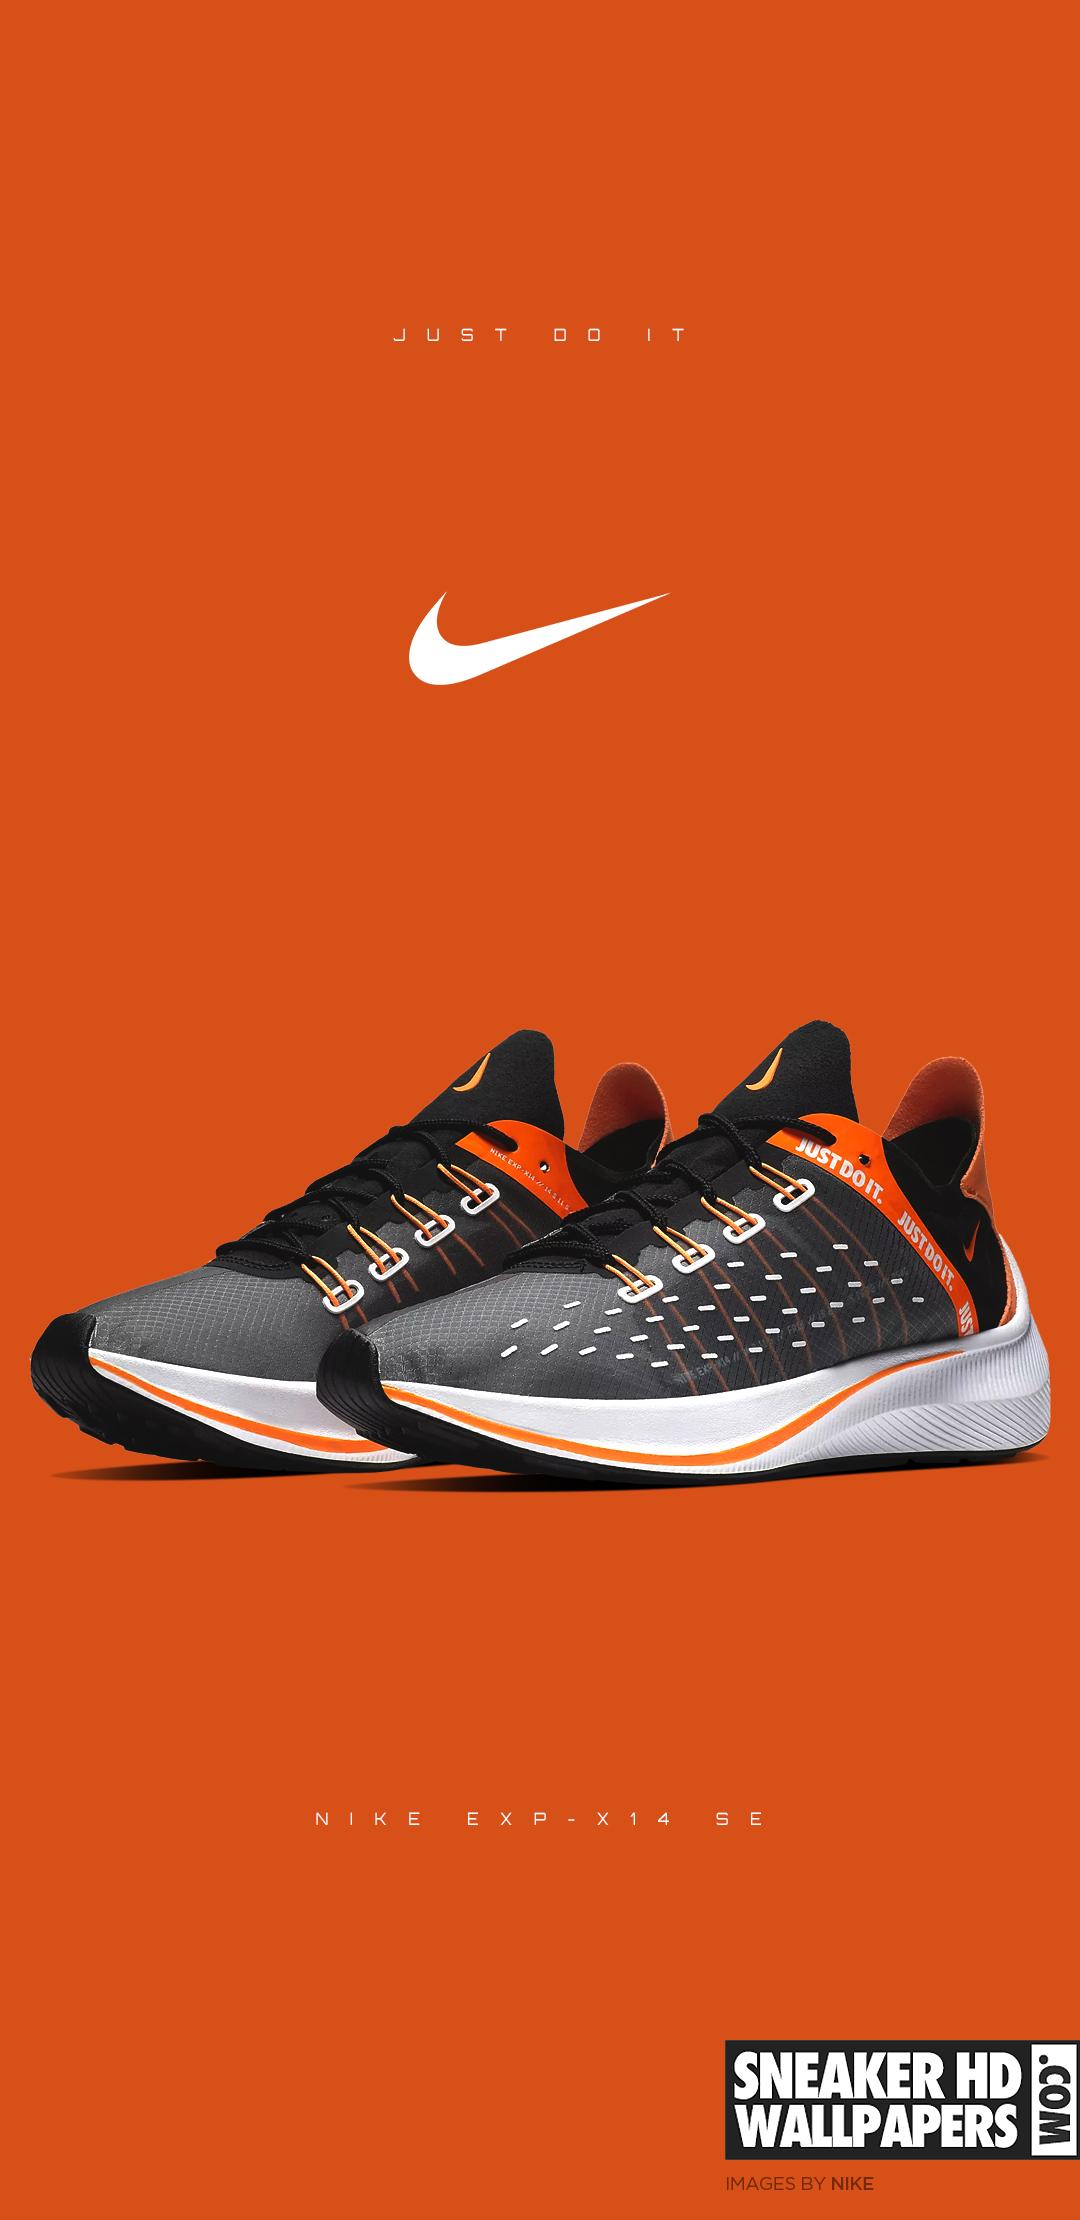 permanecer Hecho para recordar Encantada de conocerte  SneakerHDWallpapers.com – Your favorite sneakers in 4K, Retina, Mobile and  HD wallpaper resolutions! » Blog Archive Nike EXP-X14 SE